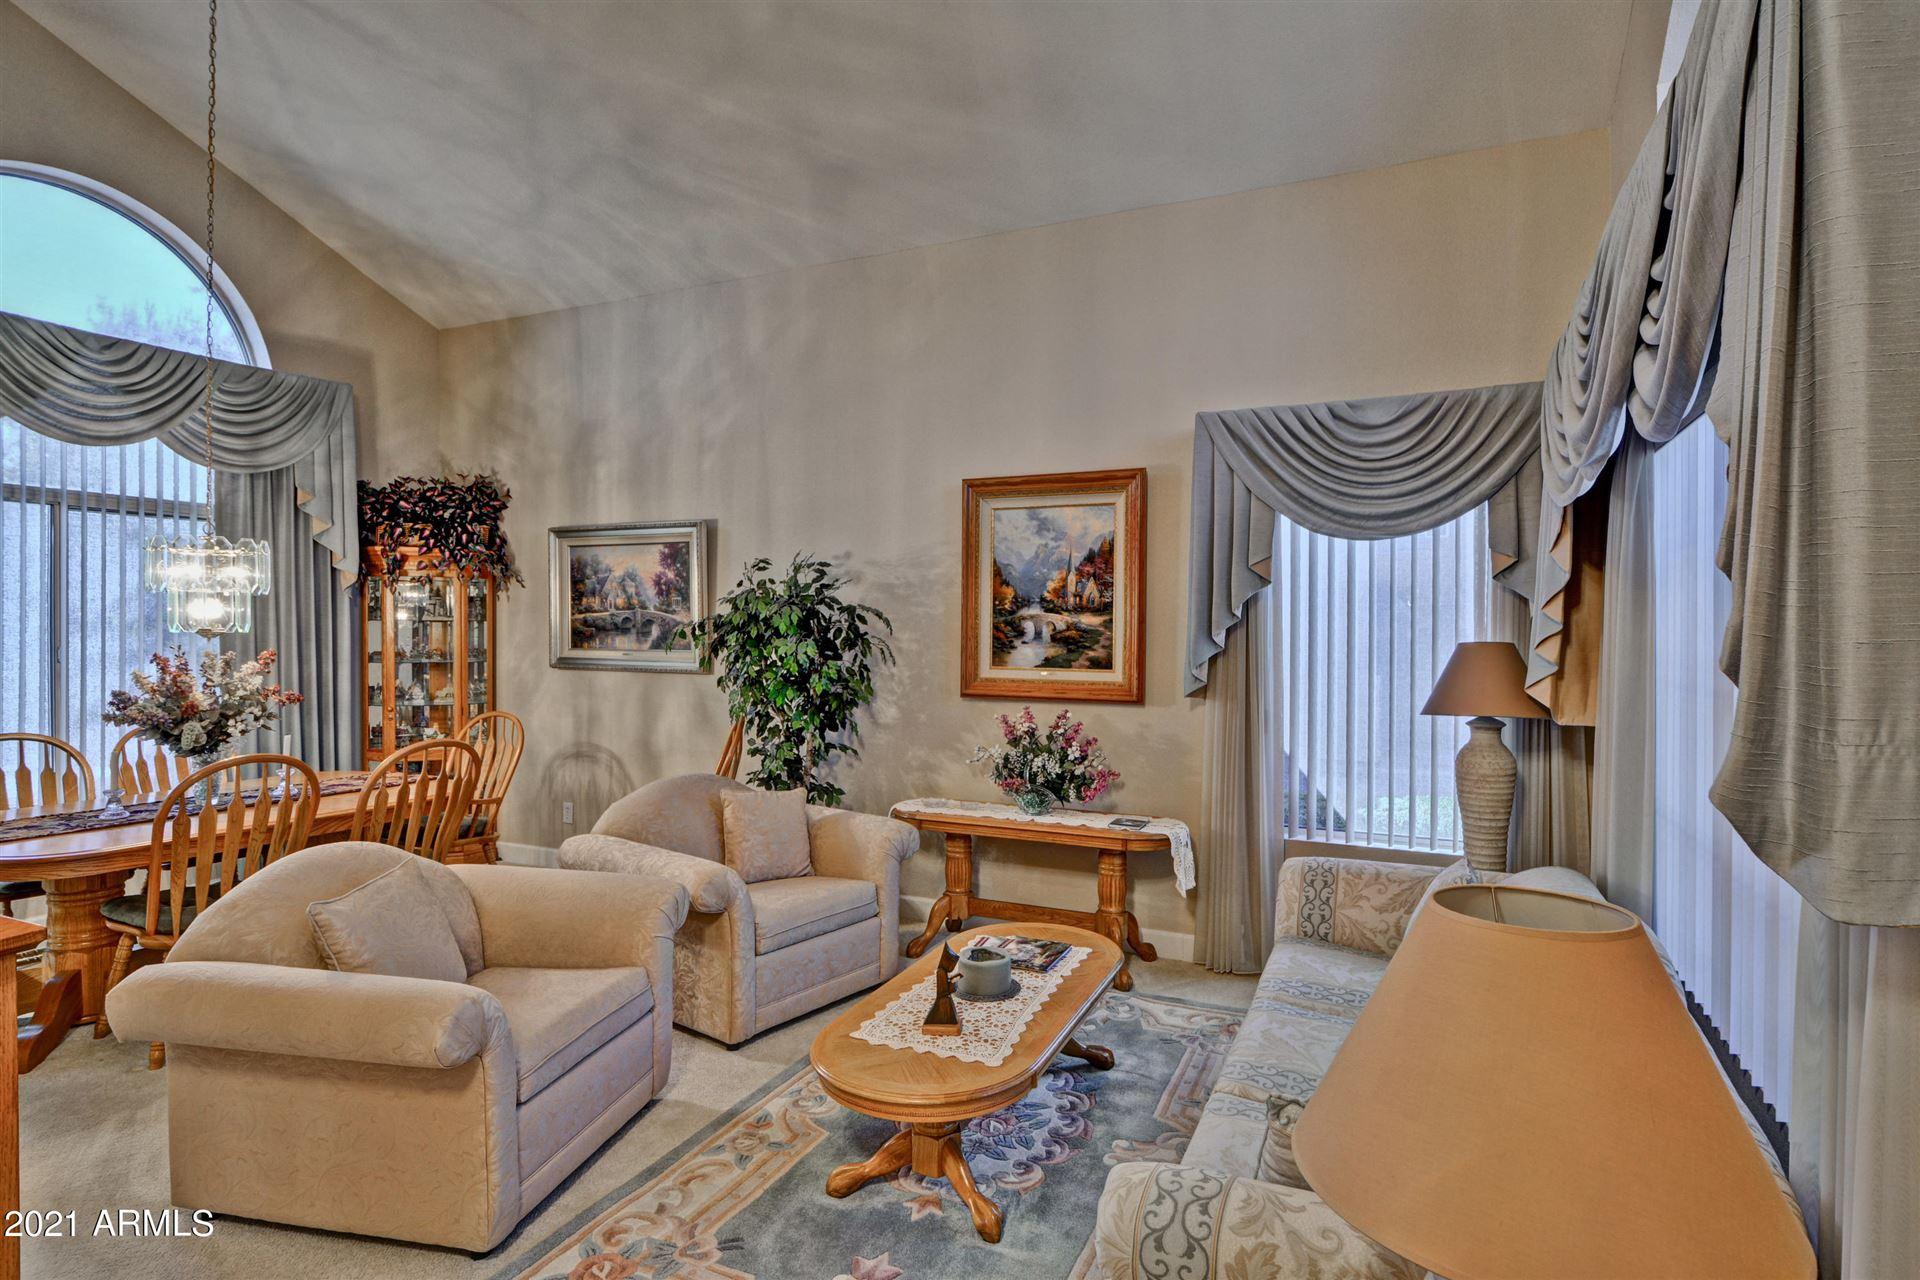 Photo of 6773 N 74th Drive, Glendale, AZ 85303 (MLS # 6200142)